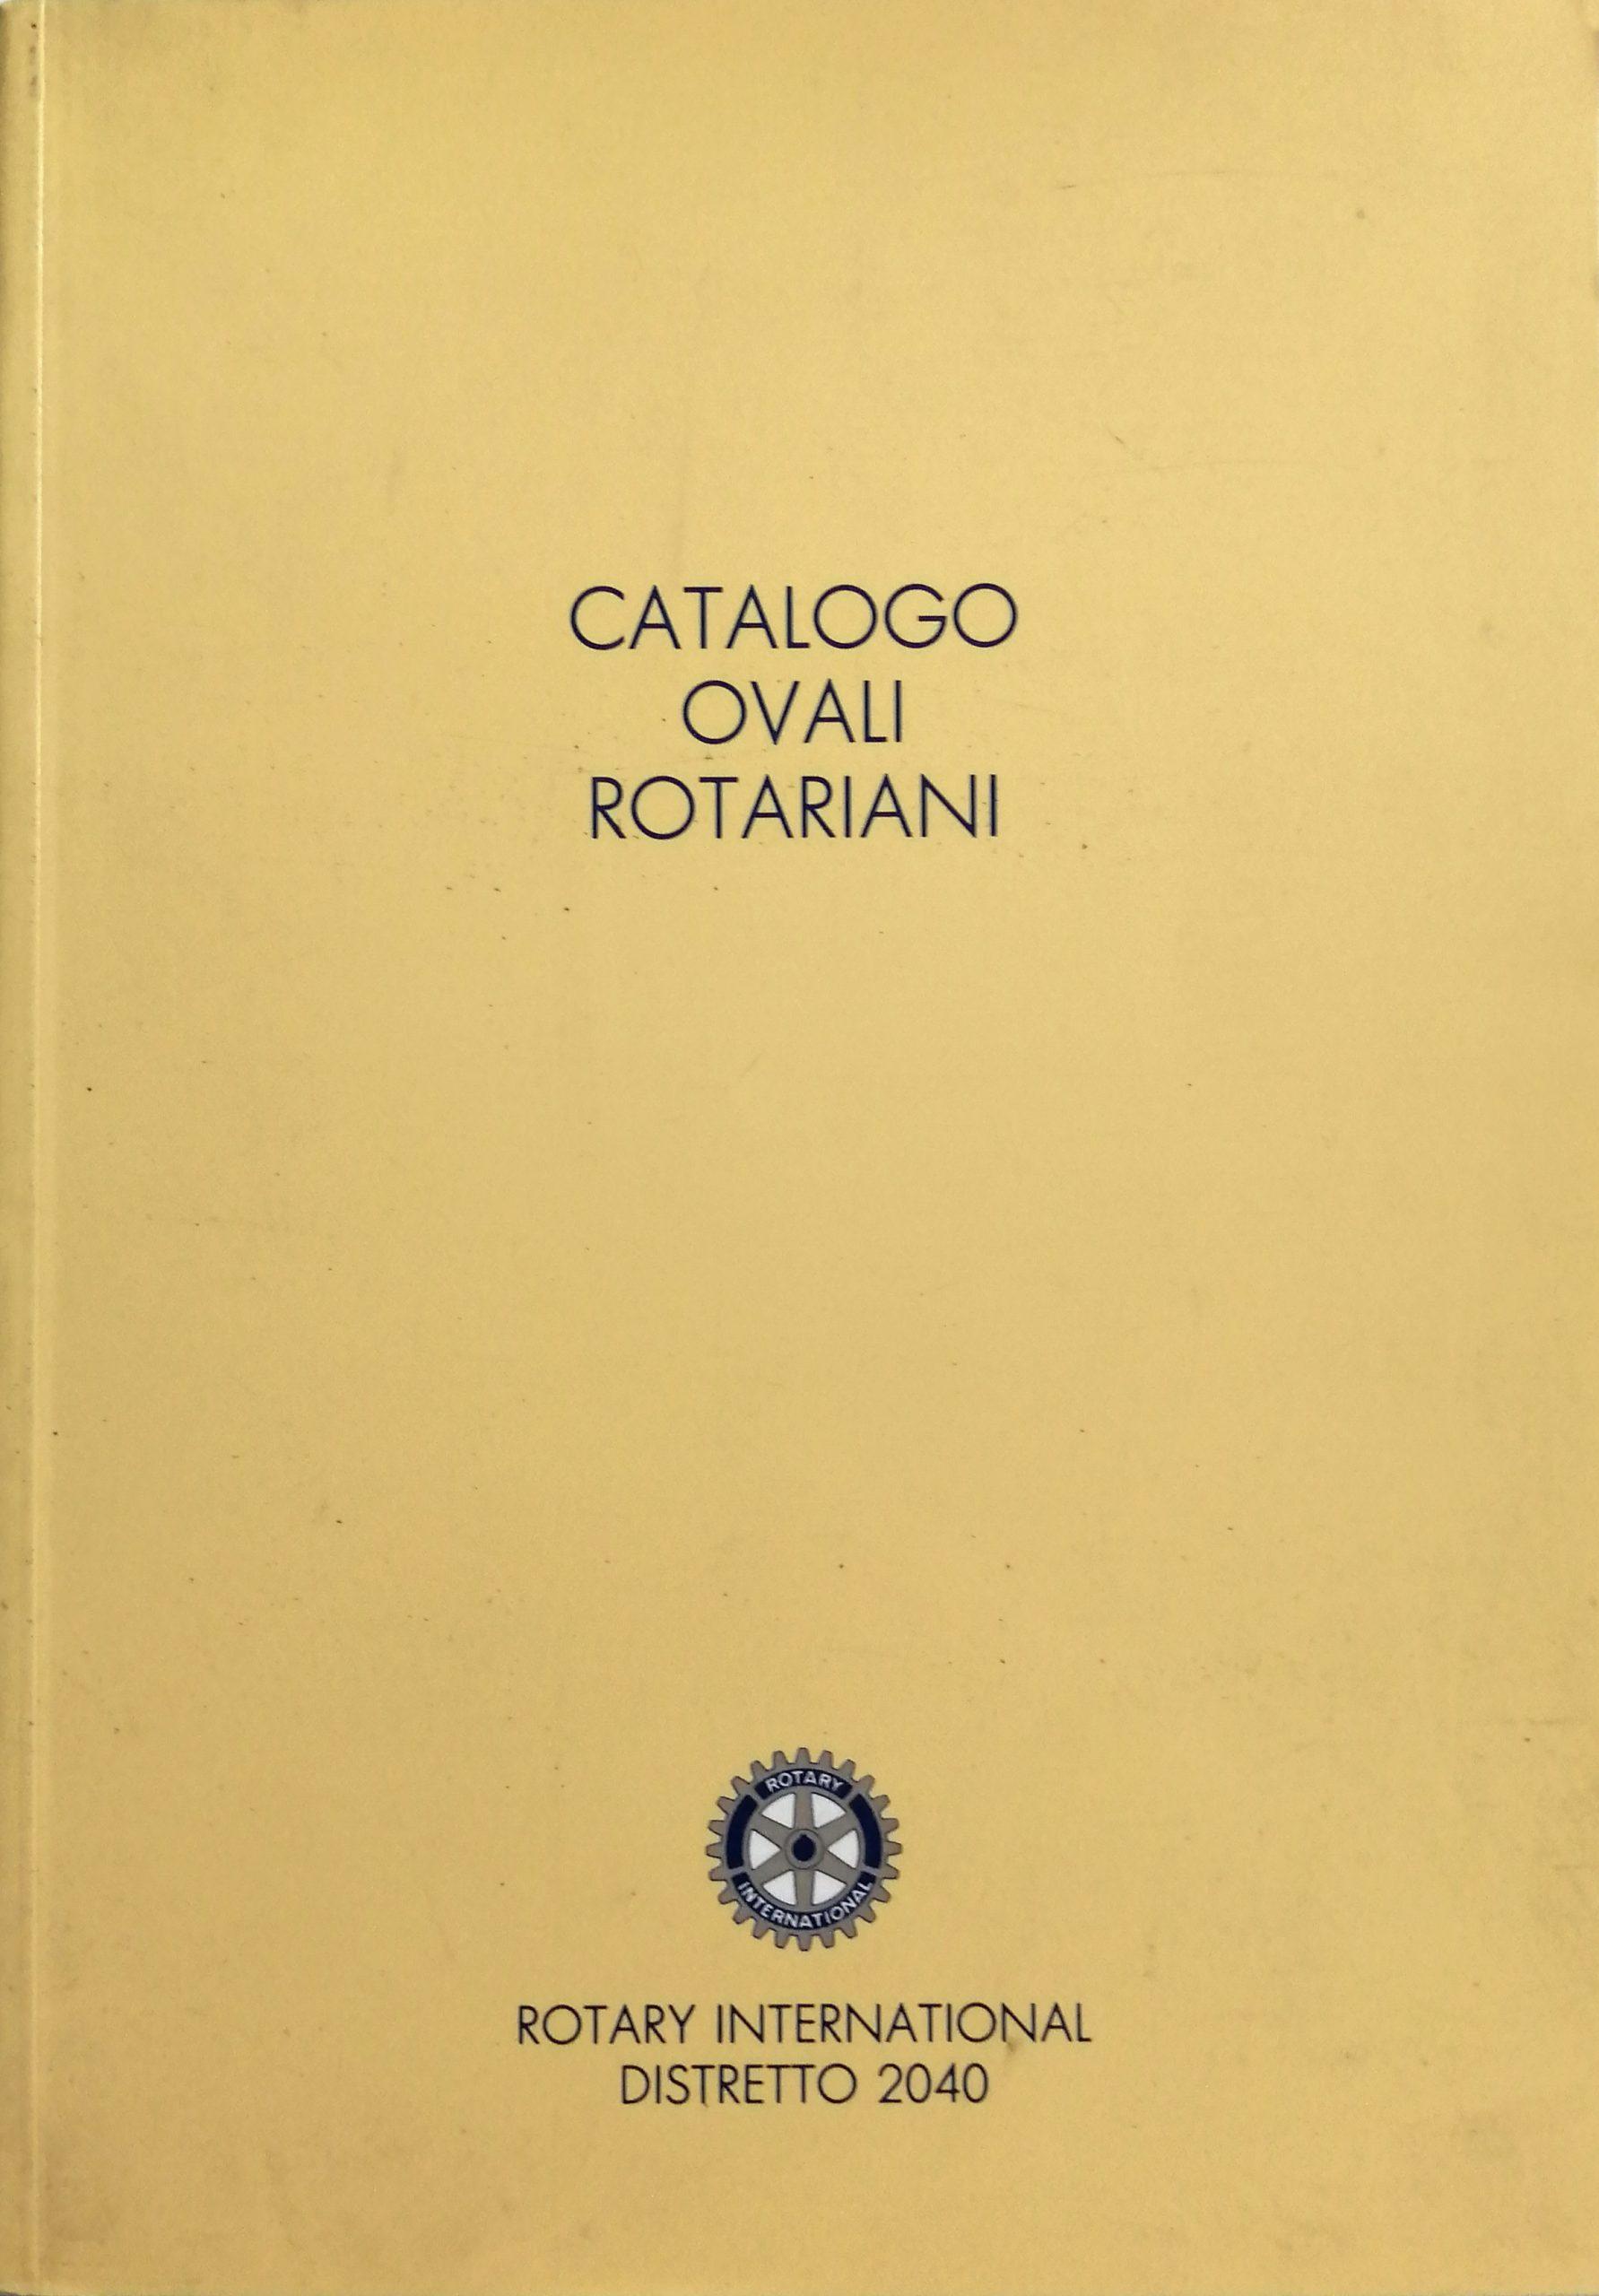 2002 Ovali rotariani Milano scaled - Bibliography/ Catalogues